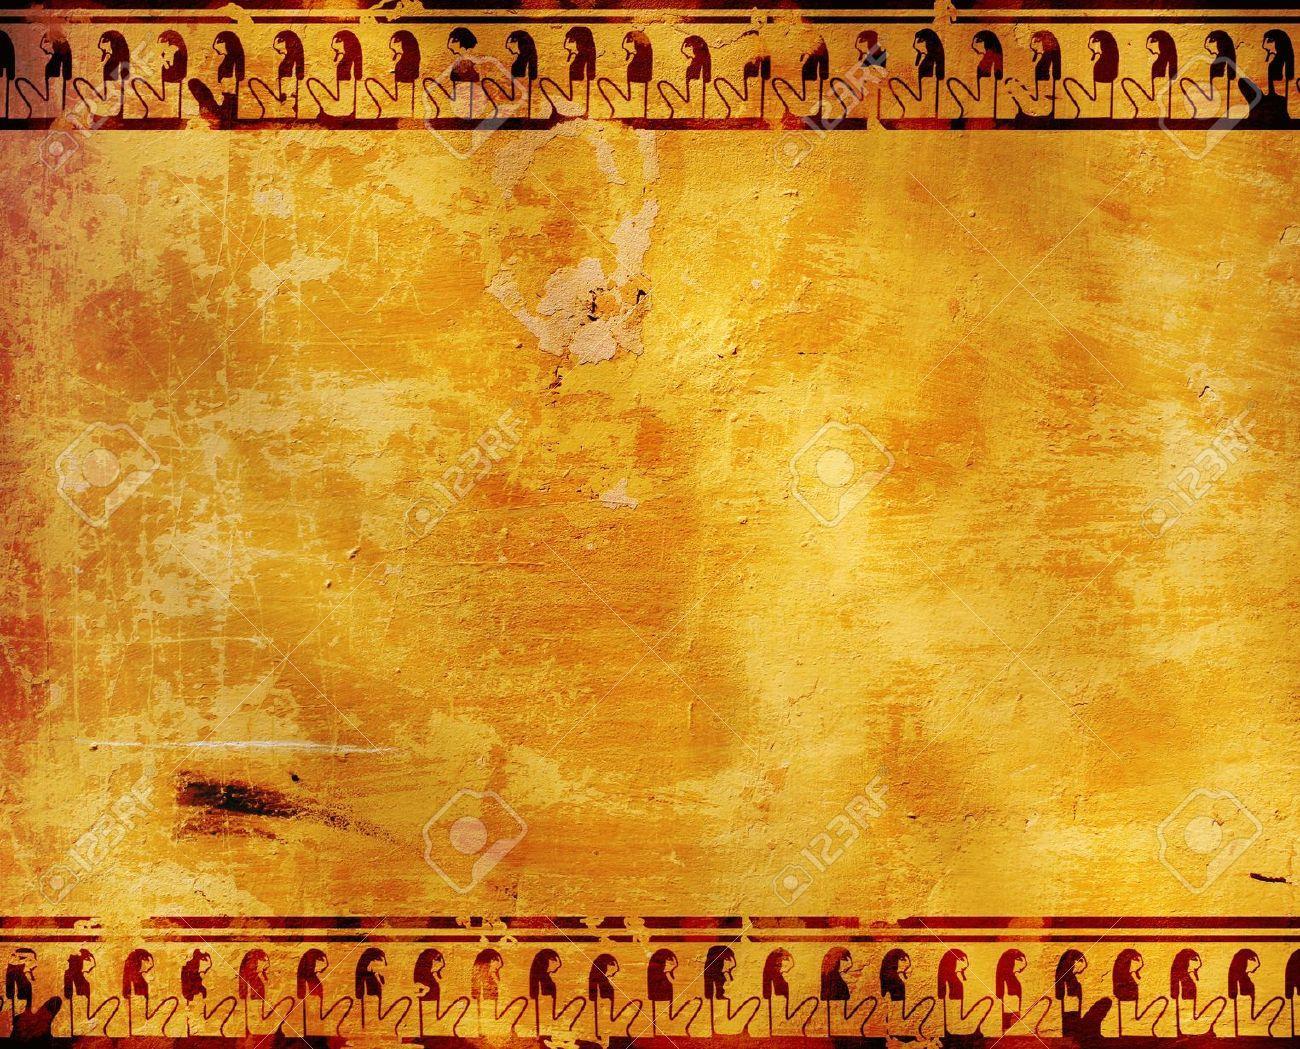 Background With Egyptian Symbols Stucco Texture Stock Photo 1300x1049